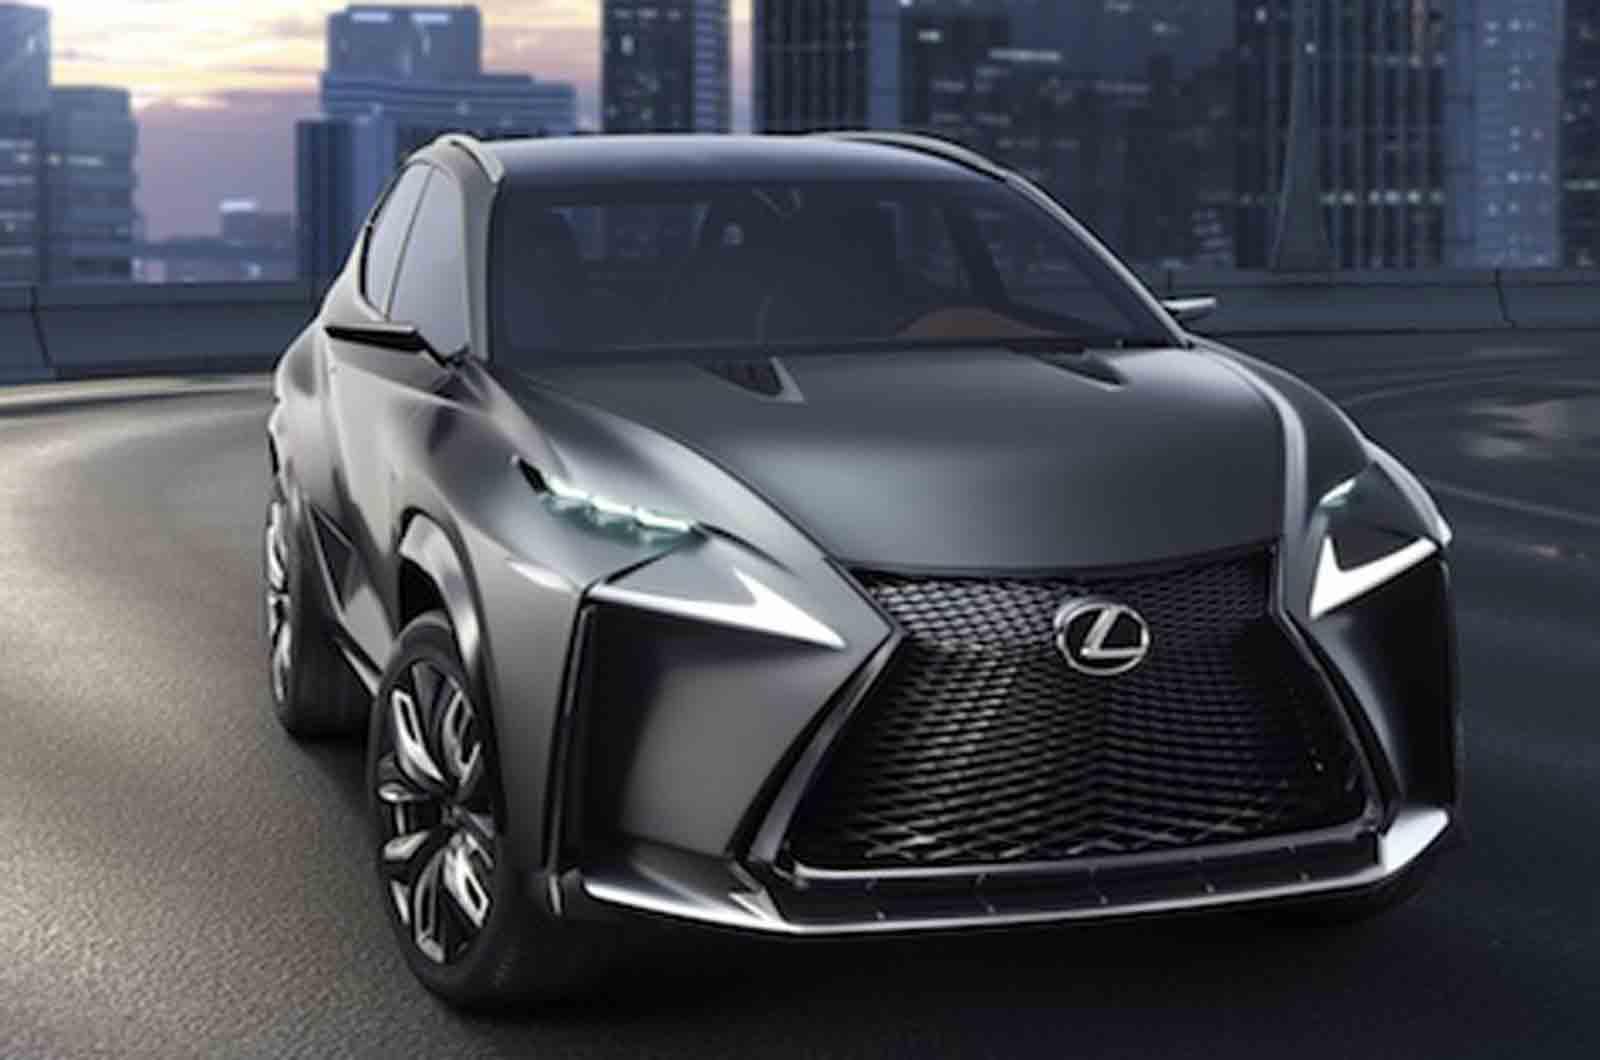 Turbocharged Lexus LF-NX Concept Heading to Tokyo - GTspirit